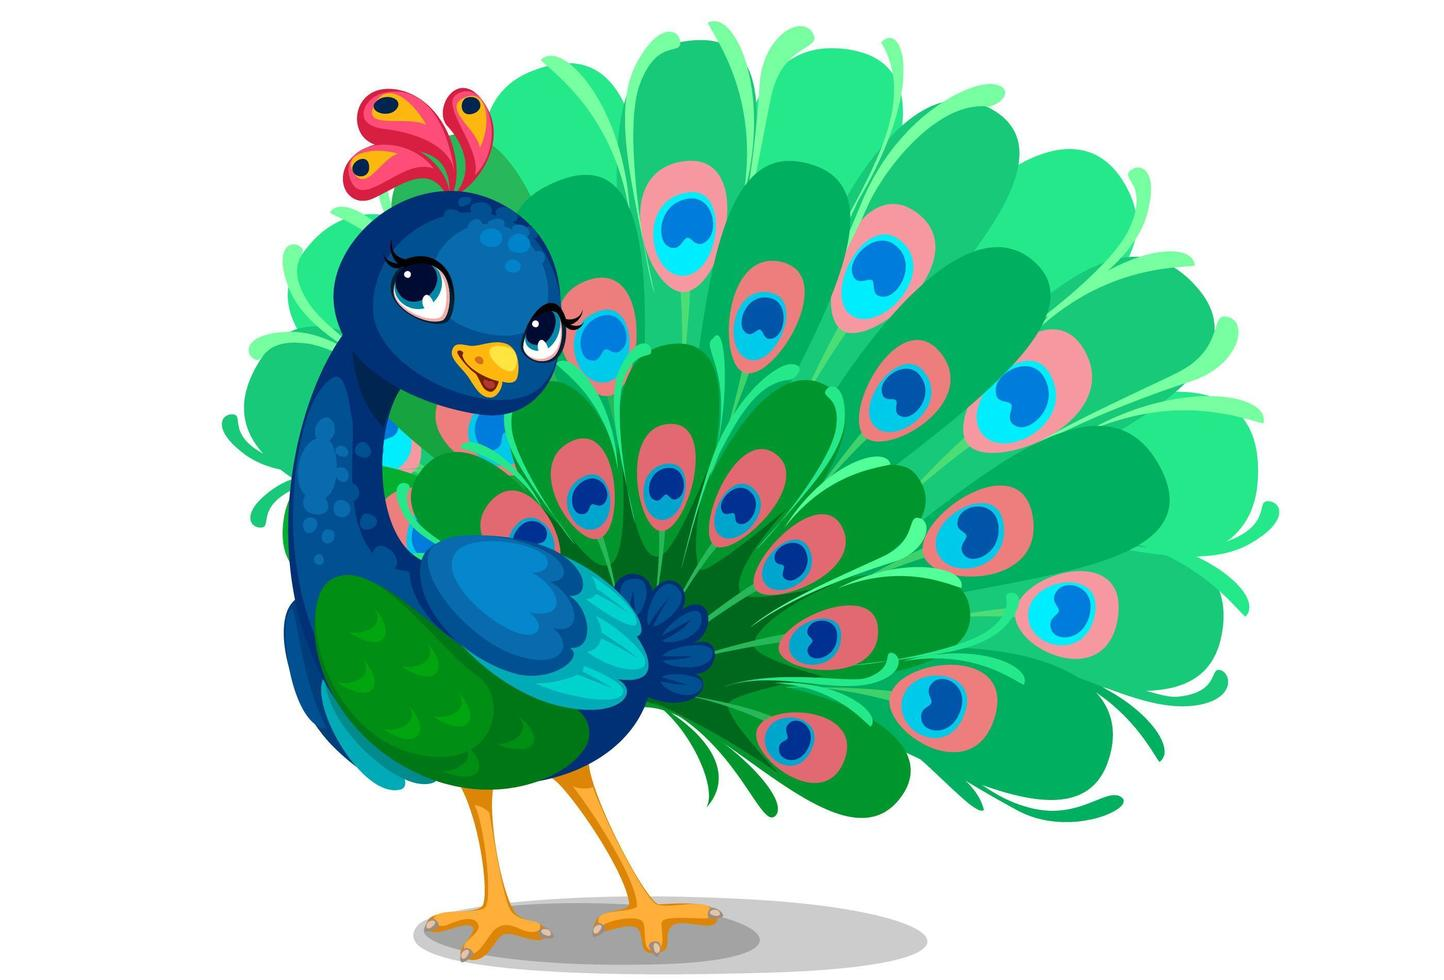 cute baby peacock cartoon download free vectors clipart graphics vector art cute baby peacock cartoon download